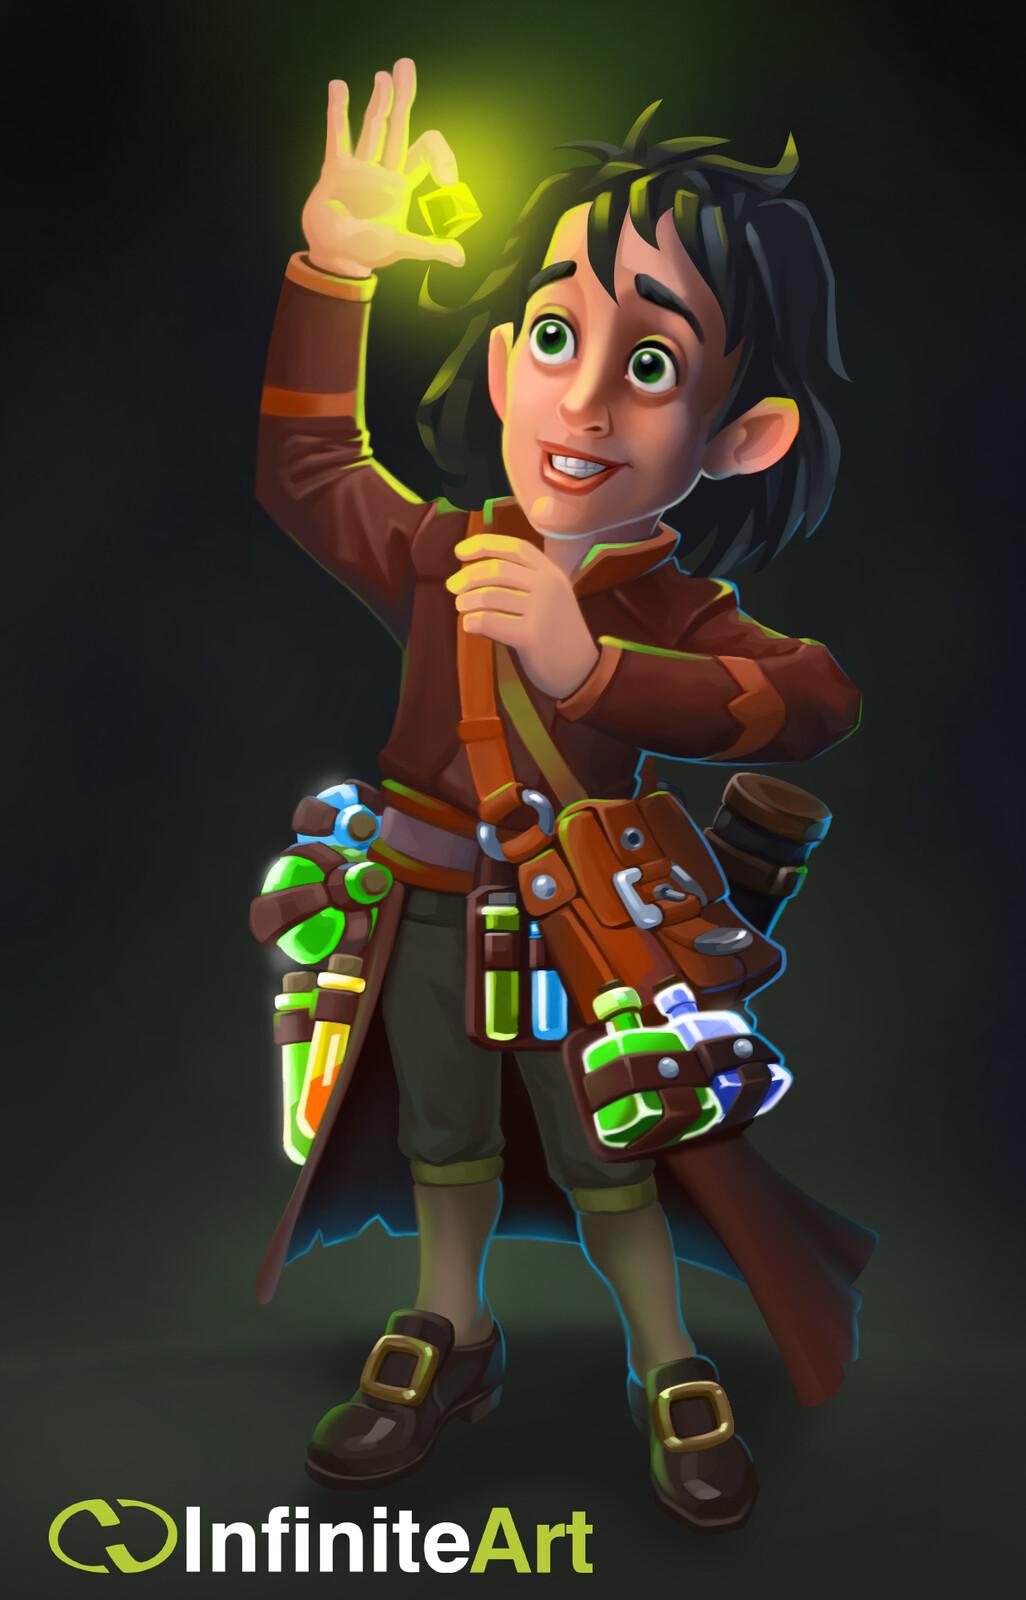 Young alchemist